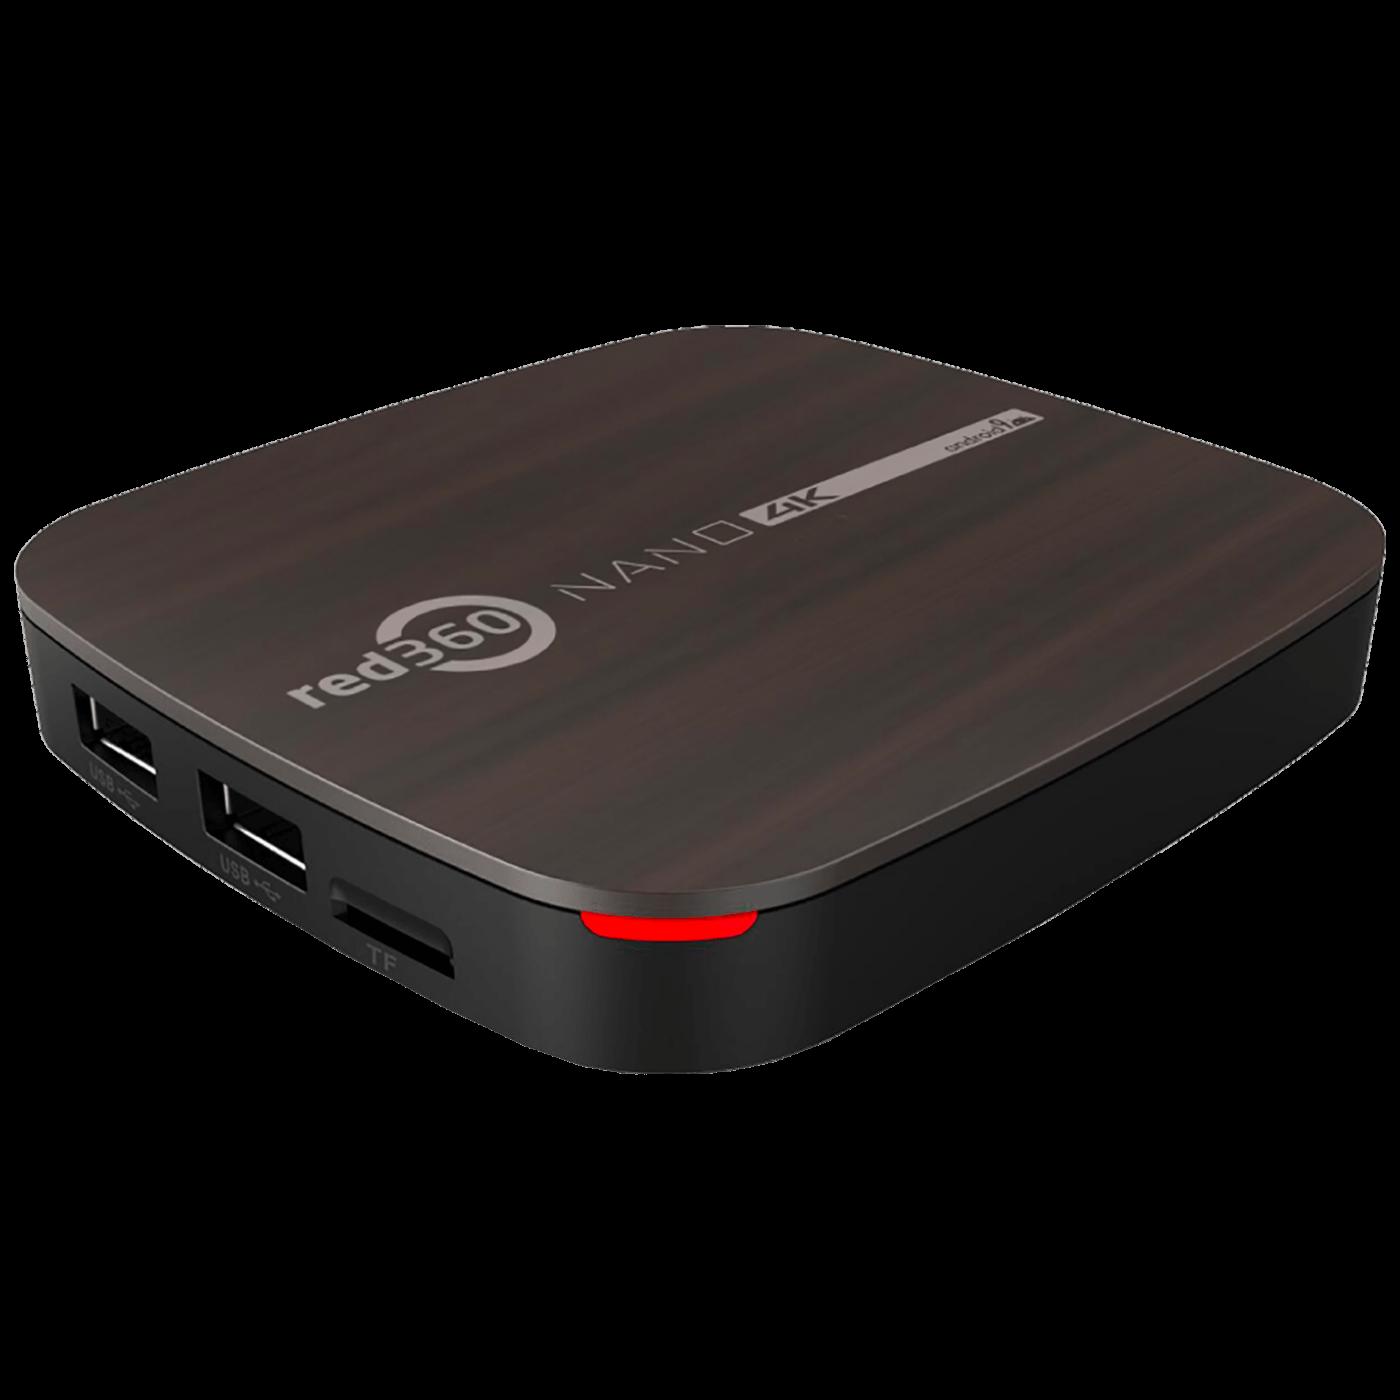 Prijemnik Android, 2/16GB , UltraHD 4K, HDR, LAN/WiFi, HDMI